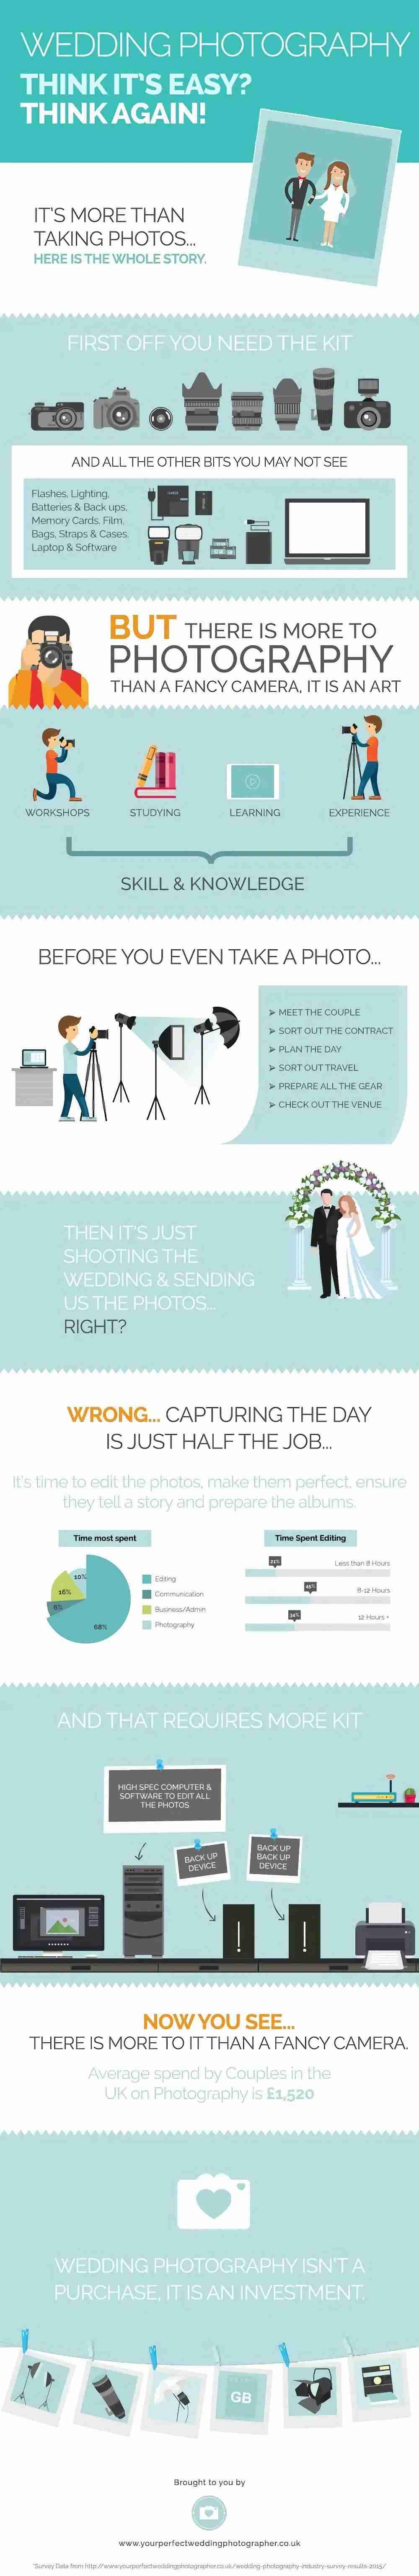 Wedding Photography Infographic